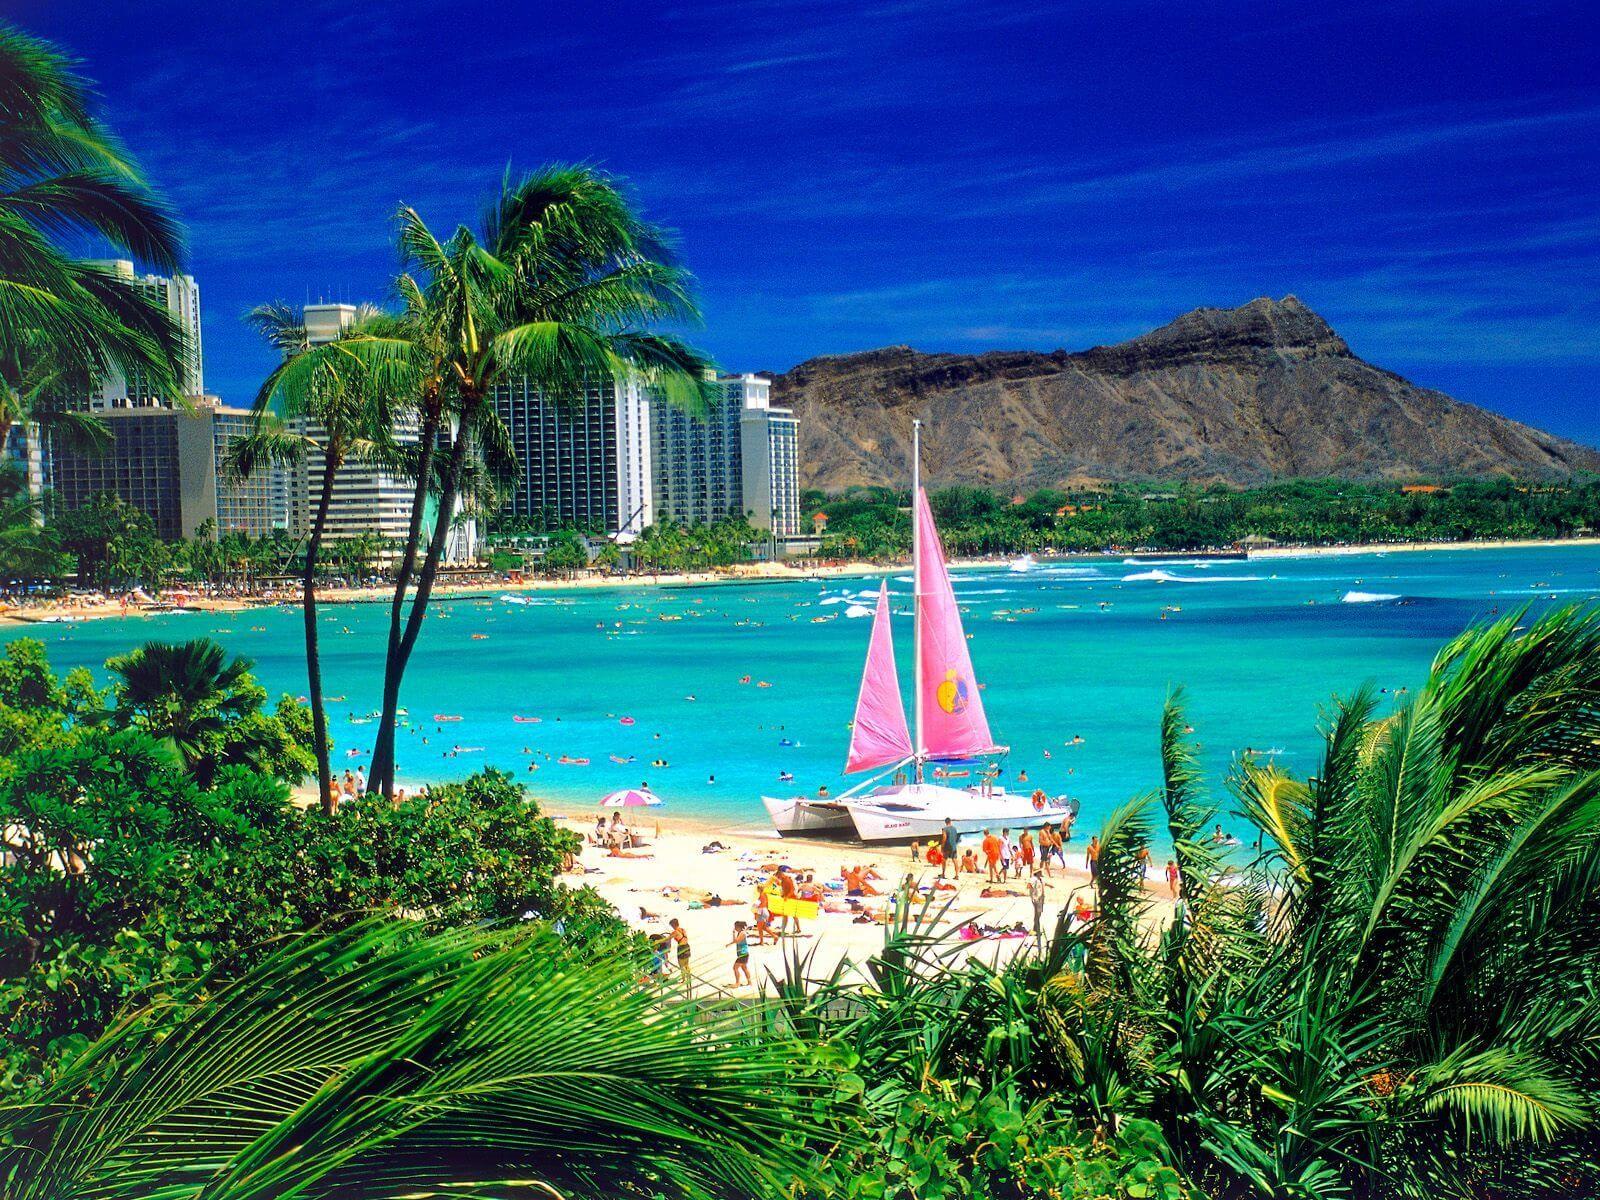 Waikiki Oahu Hawaii Normal Hd Wallpapers High Definition 100 Hd Quality Best Vacation Spots Best Honeymoon Destinations Oahu Travel